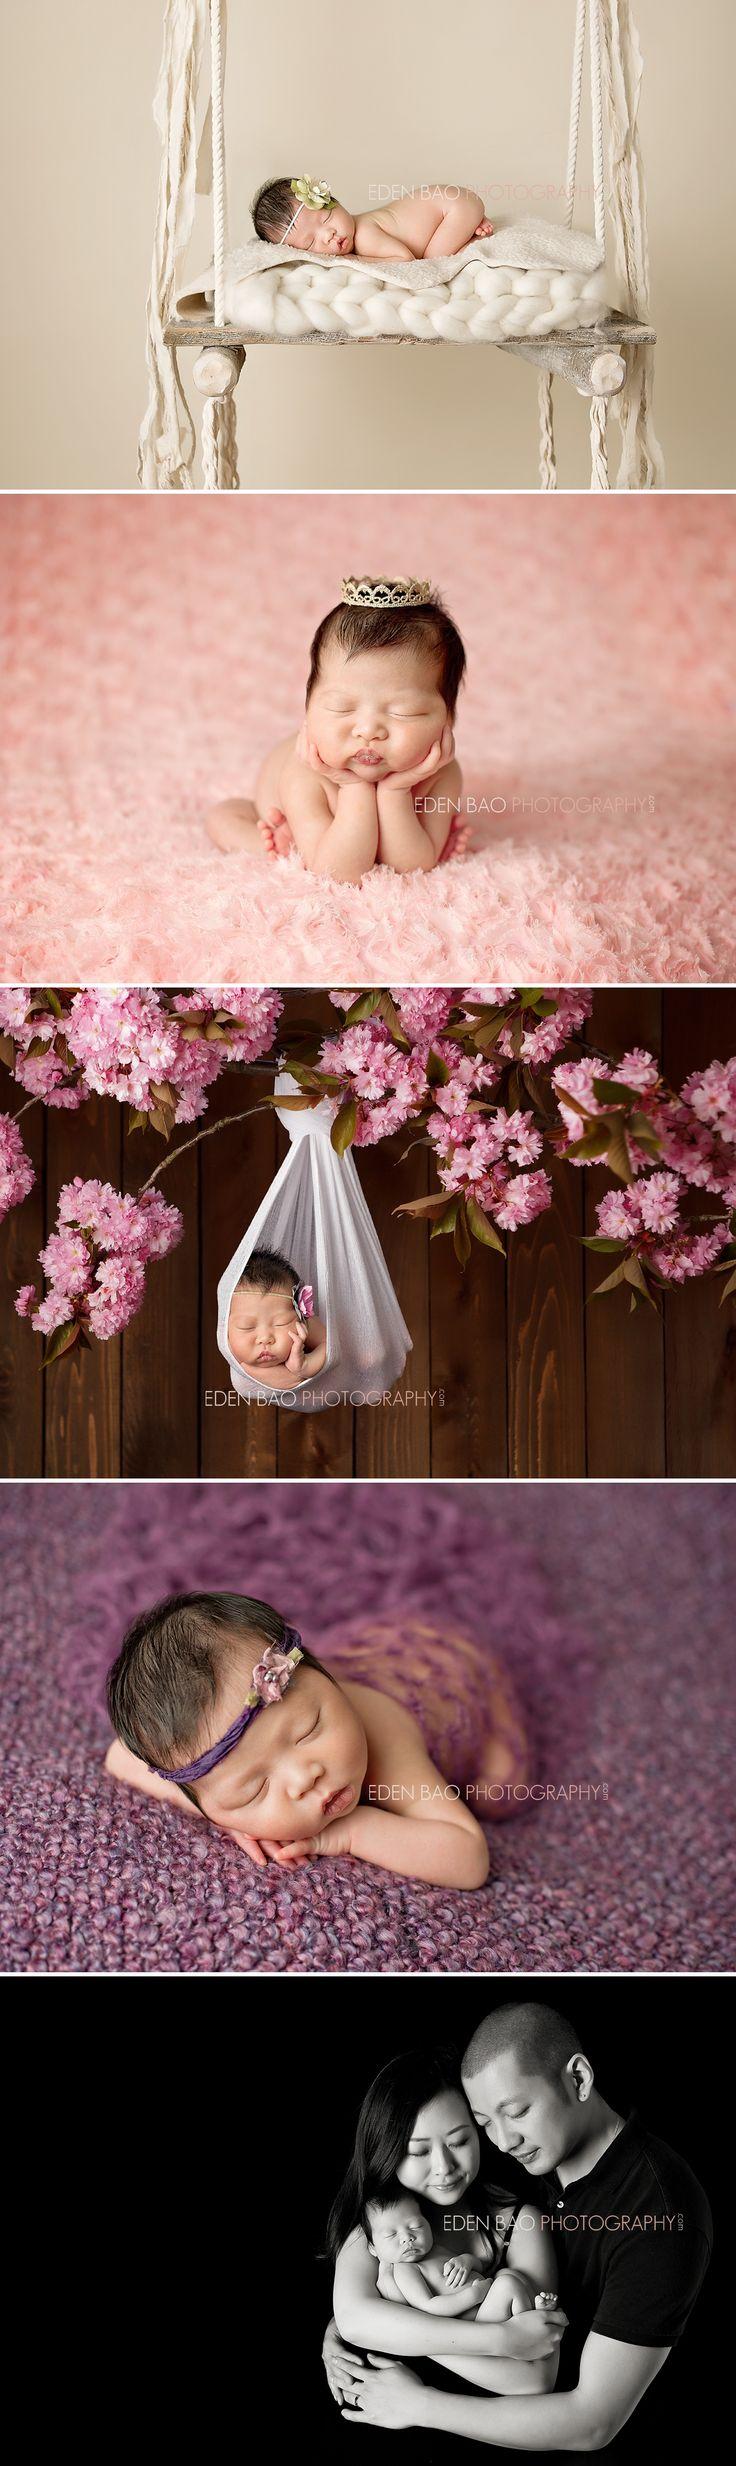 Delta BC Newborn Photographer Eden Bao   Denise 9-days-new - Vancouver BC Maternity Newborn Baby Photographer   Eden Bao Photography